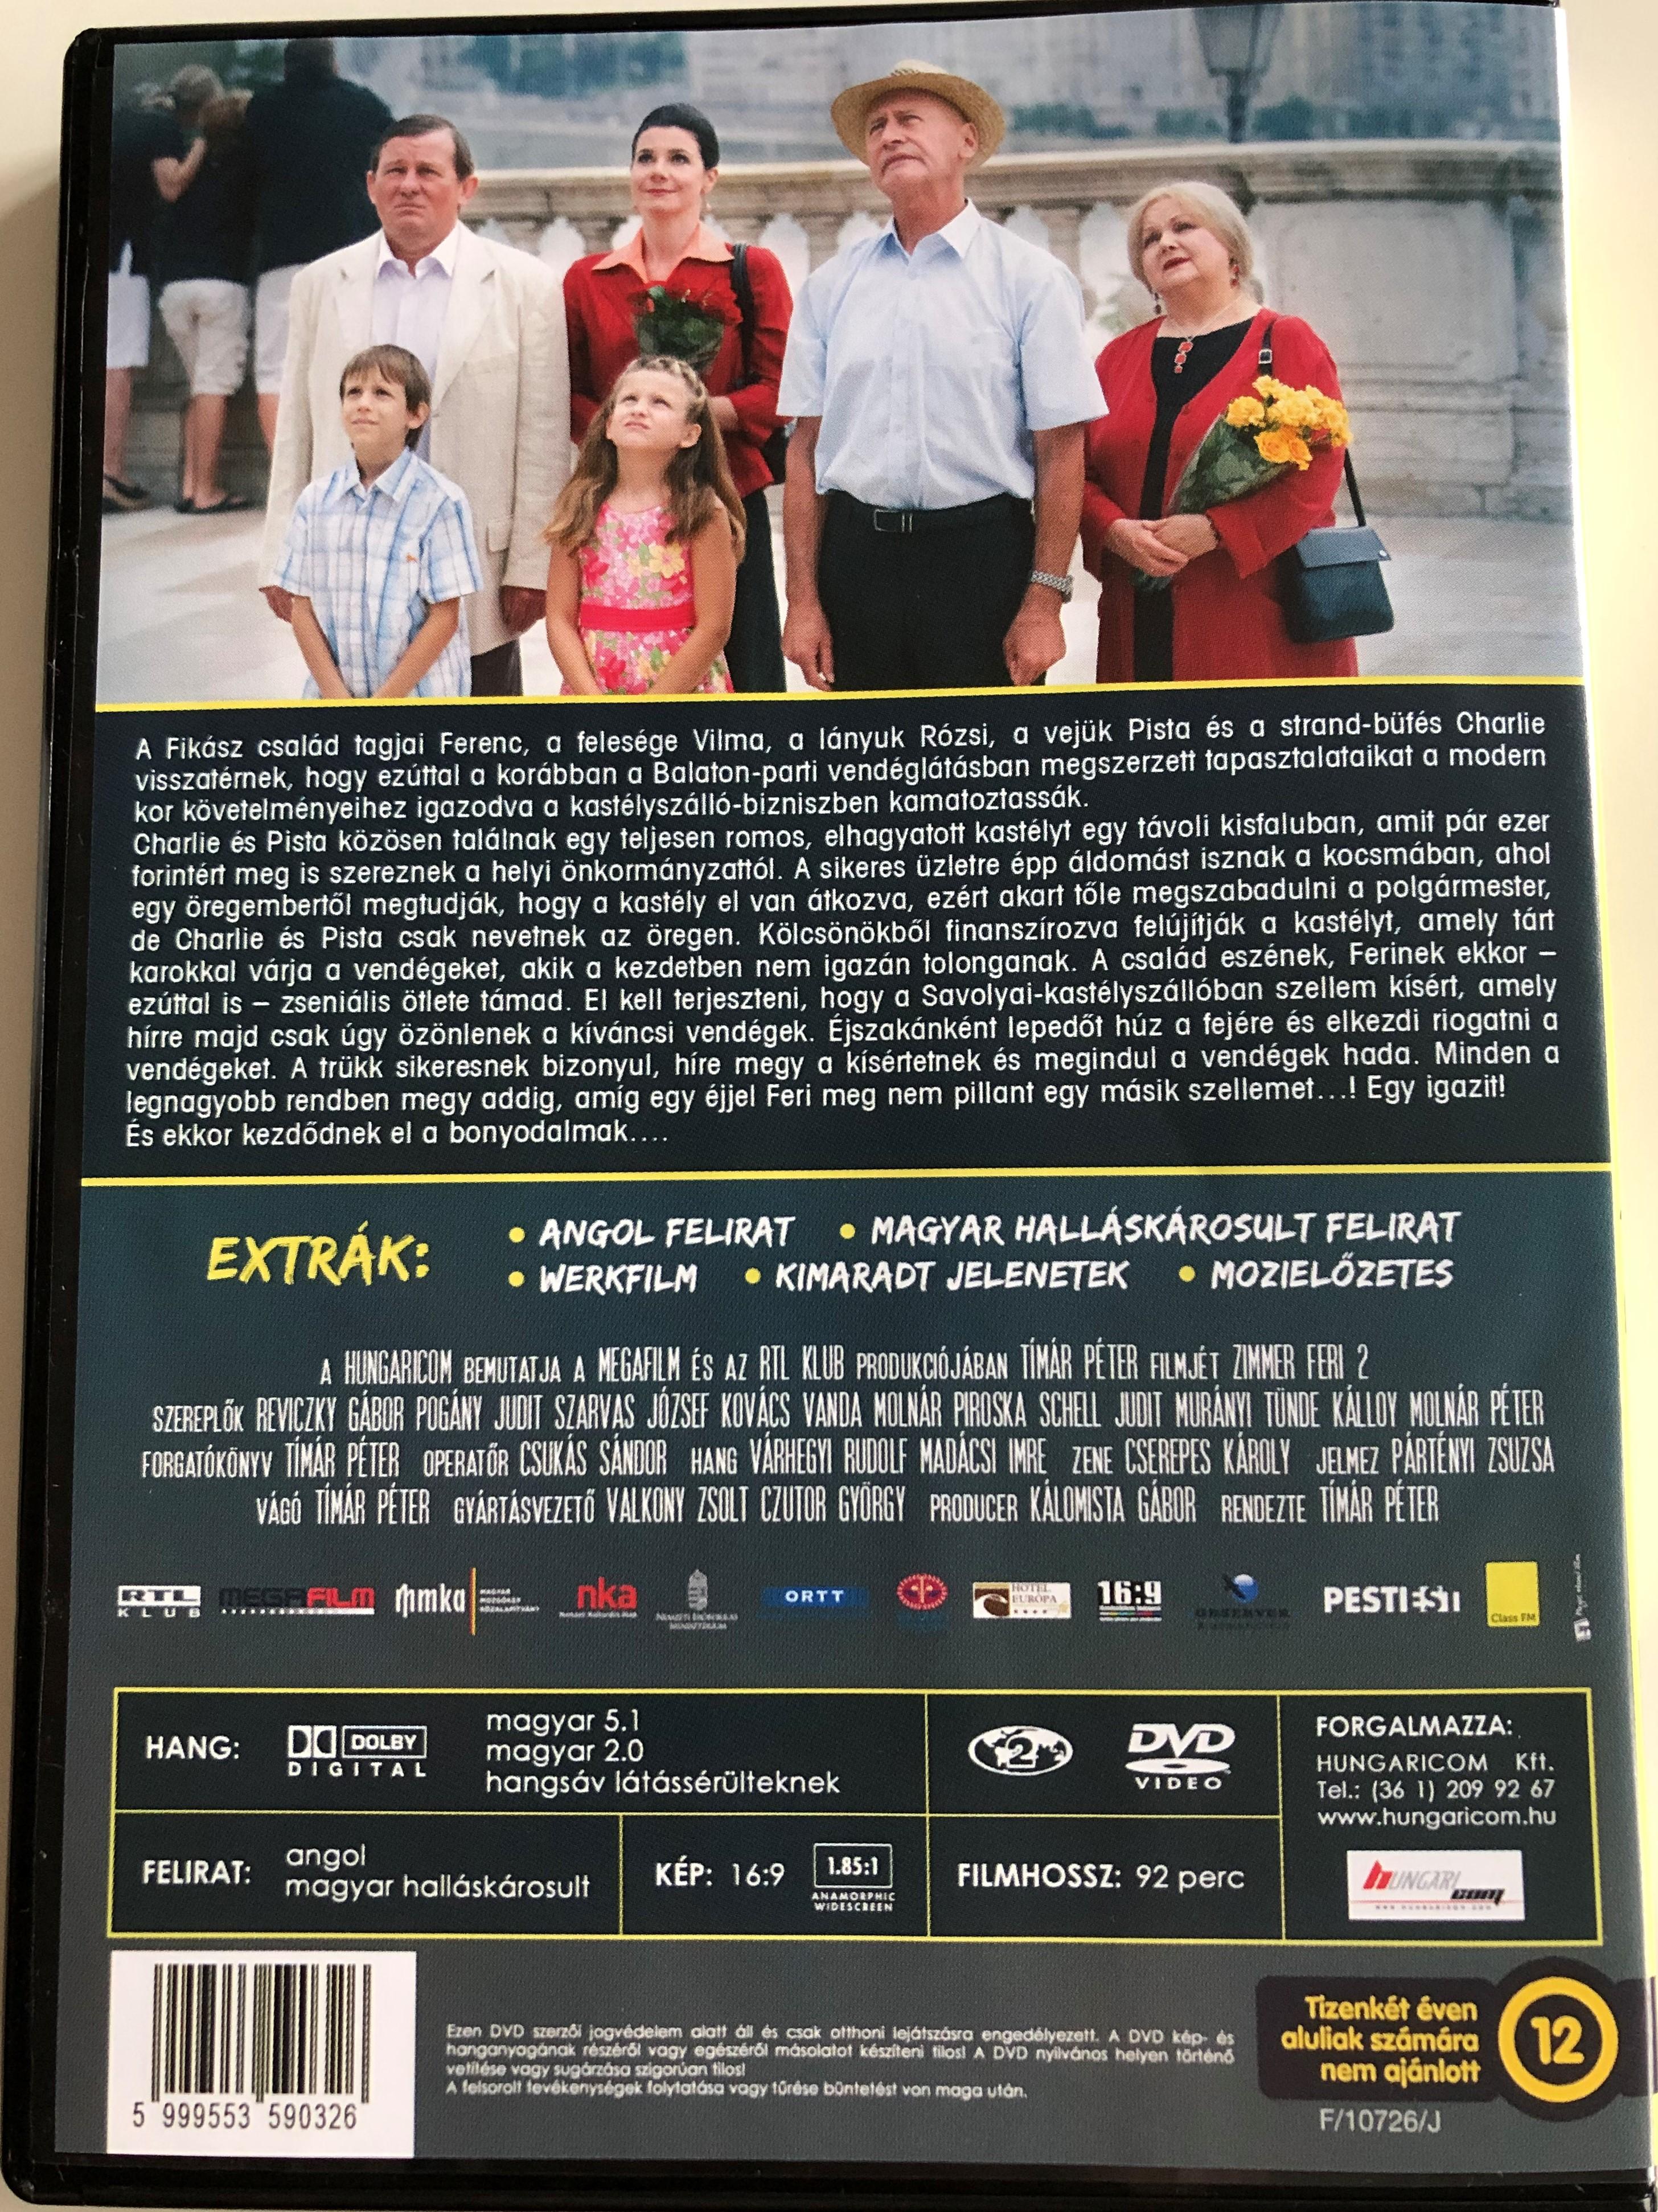 zimmer-feri-2-dvd-2010-aj-nd-k-zimmer-feri-1-3.jpg